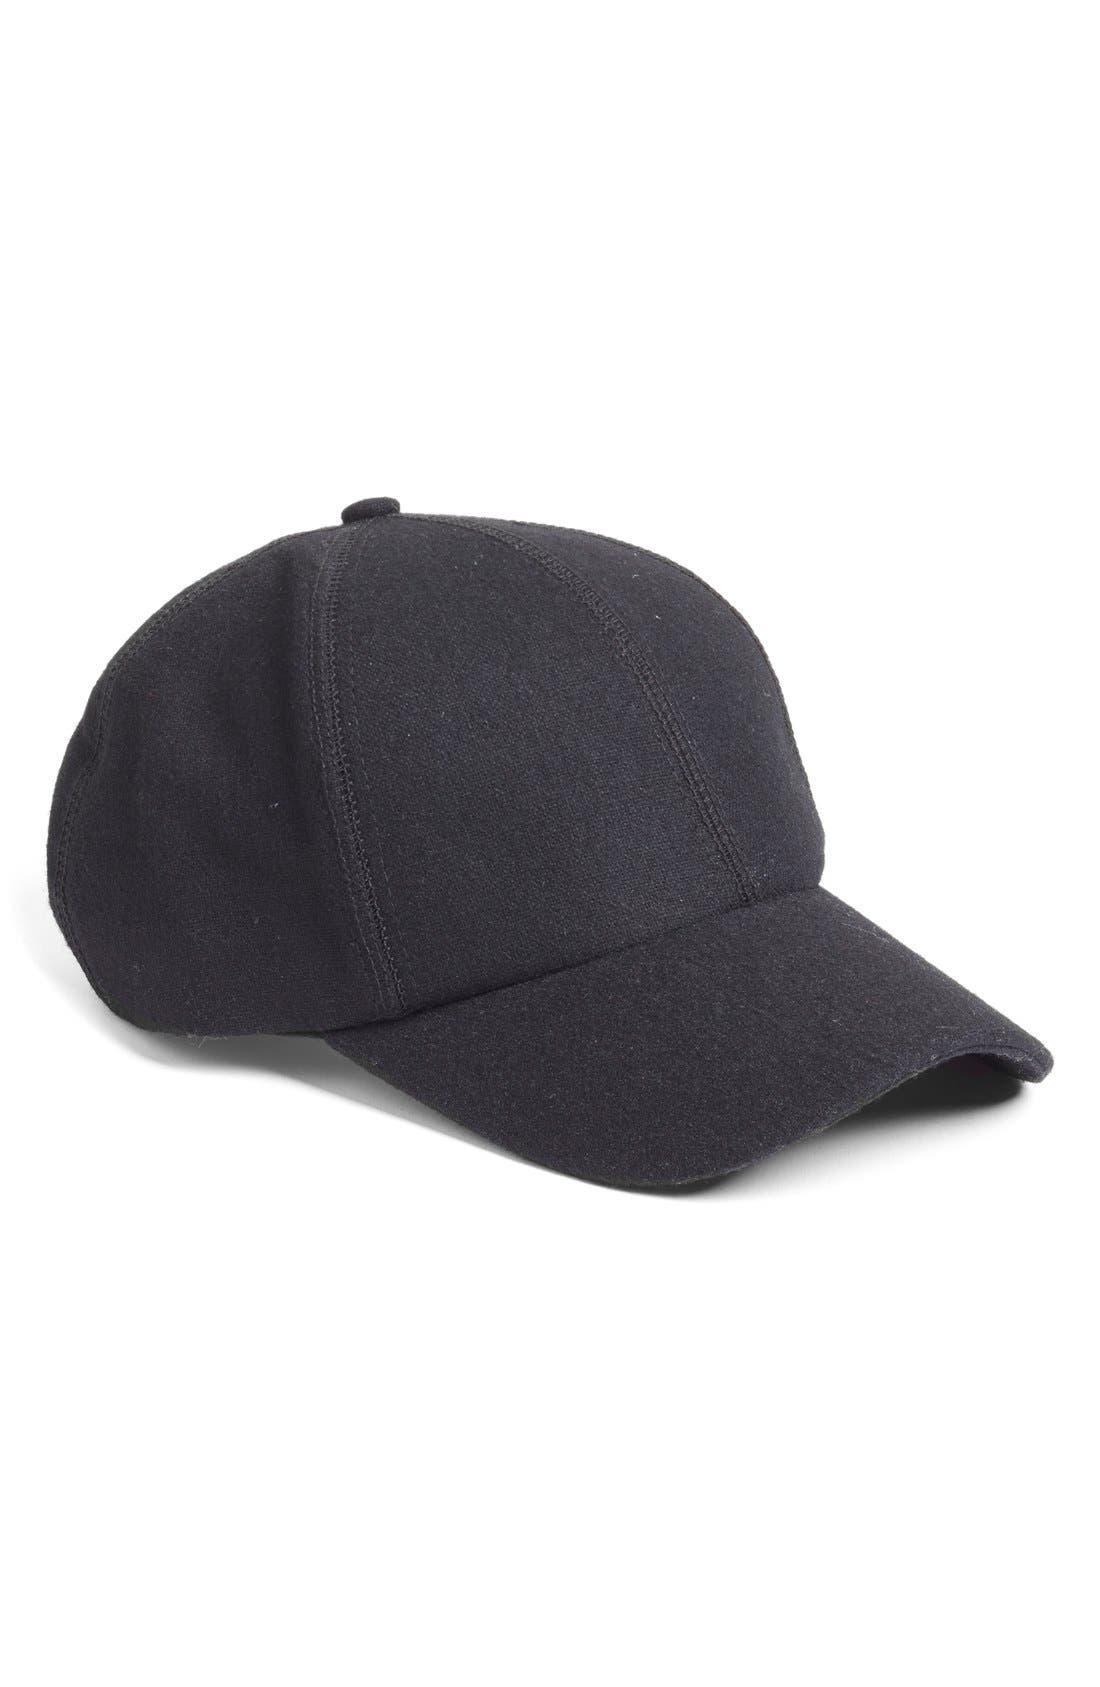 Melton Wool Baseball Cap,                             Main thumbnail 1, color,                             001